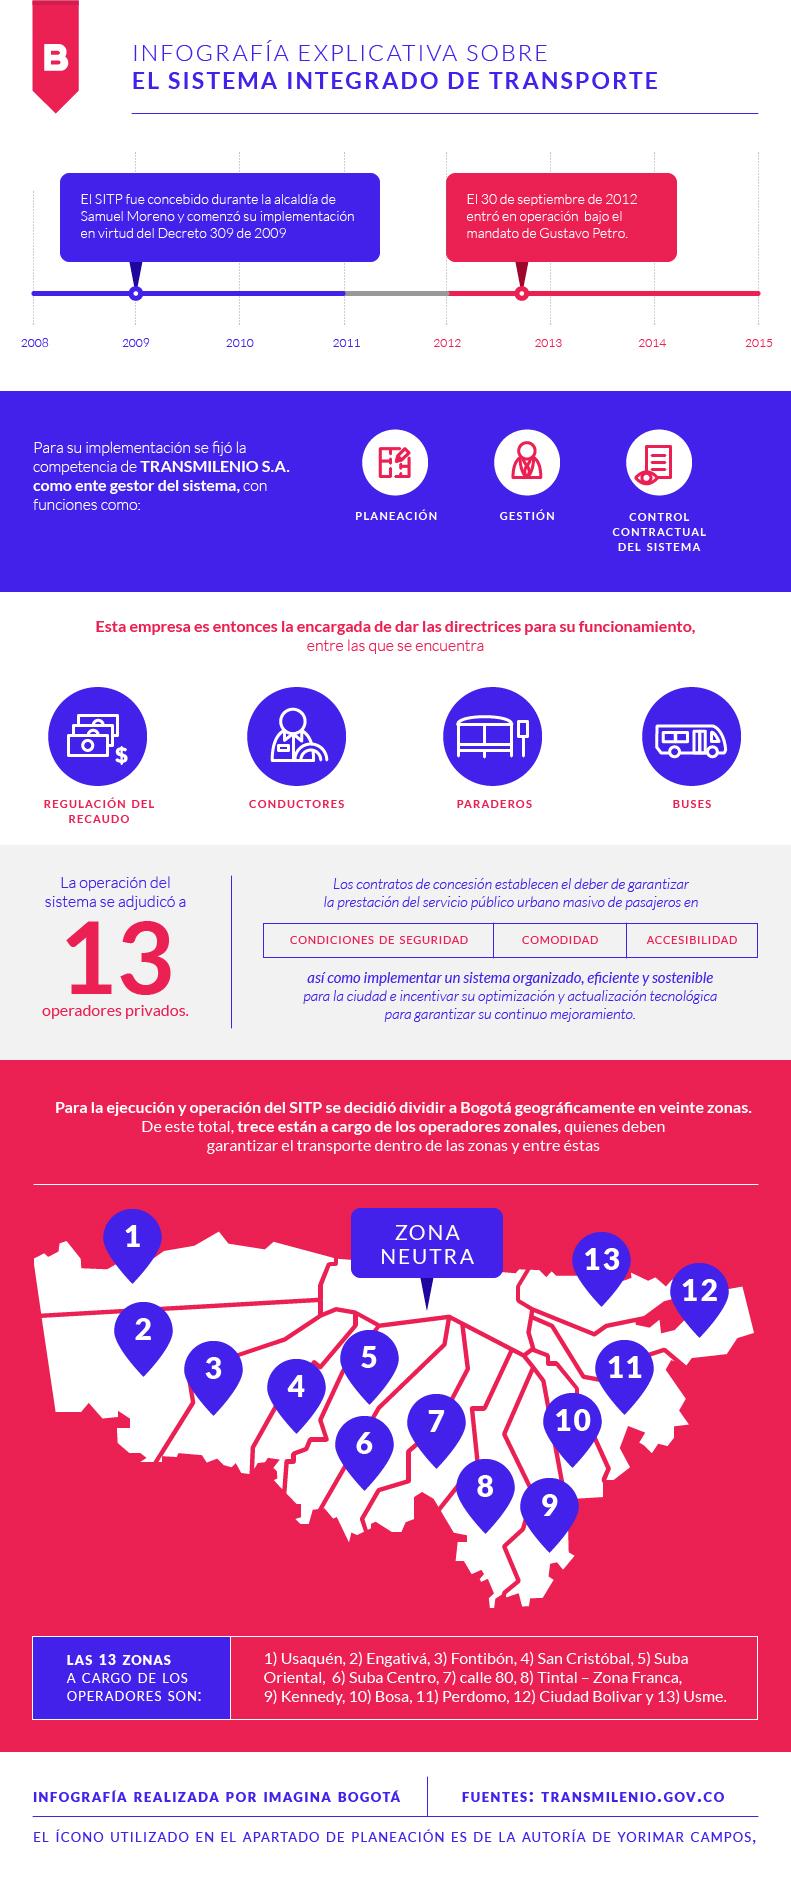 infographic infografia transporte bogota data visualization transmilenio SITP transportation public transportation